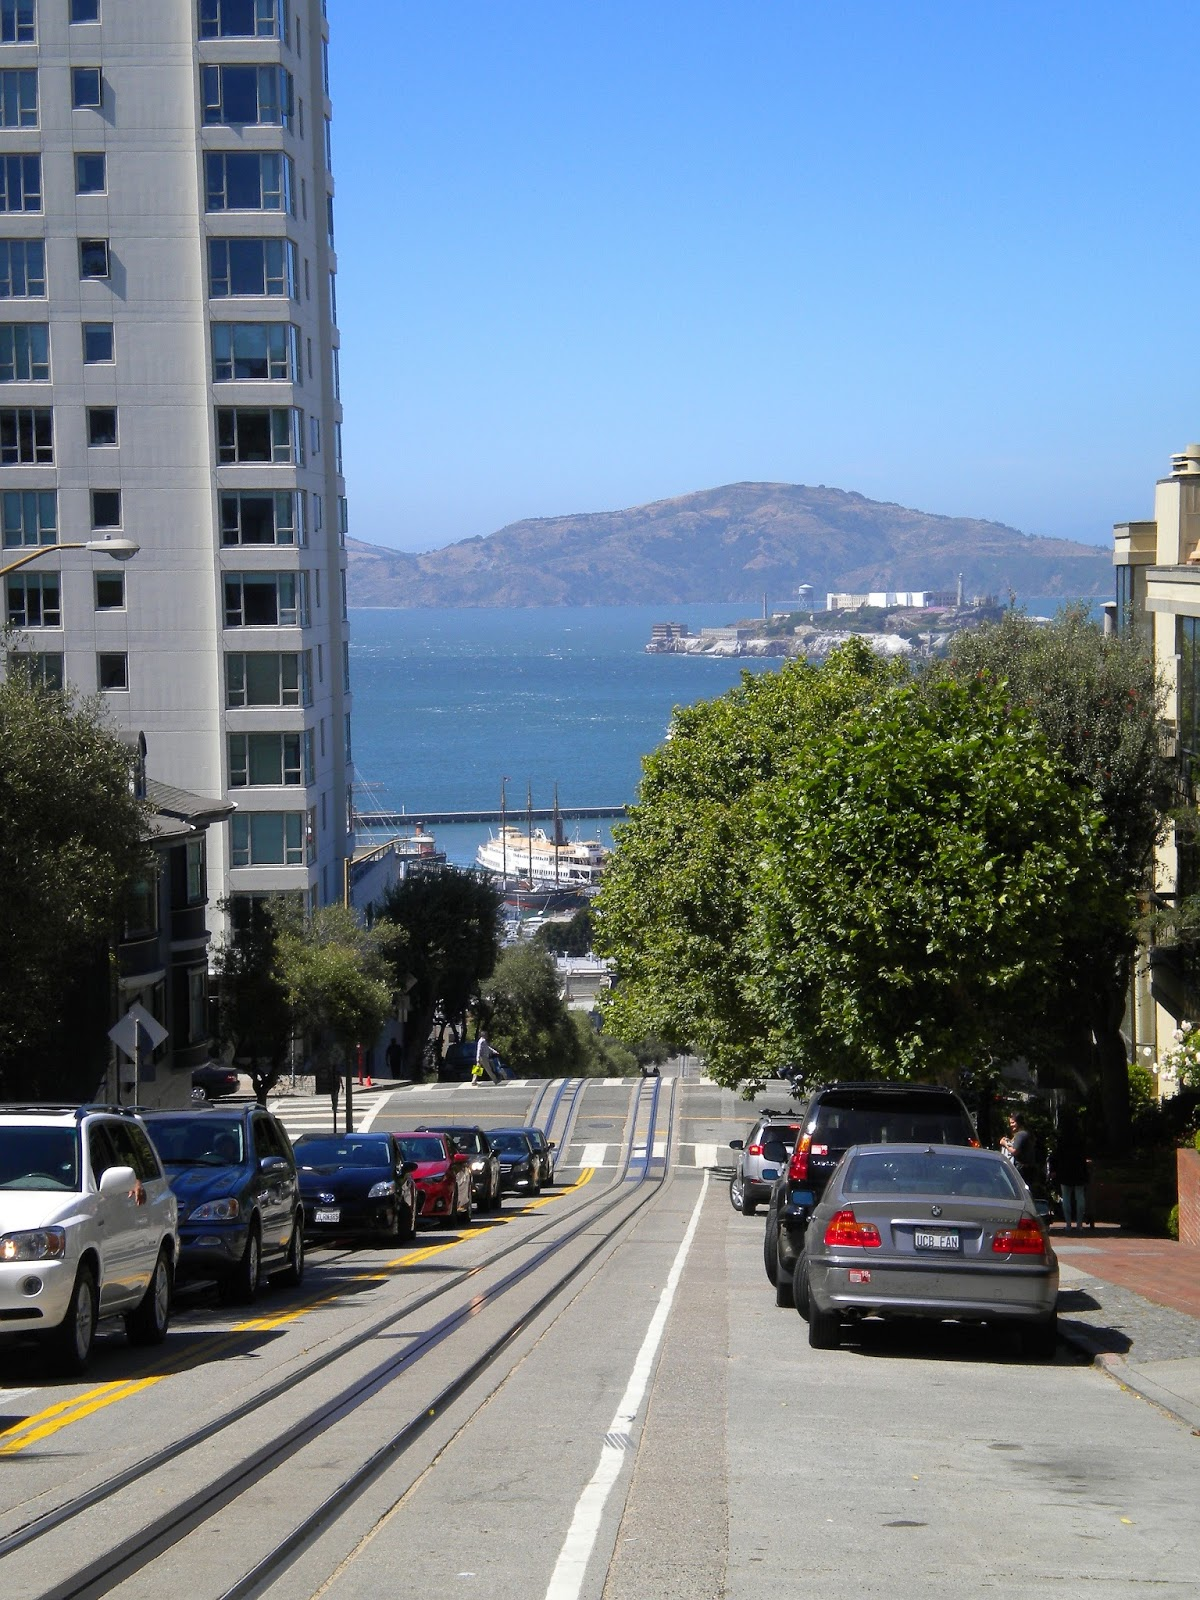 san francisco matkailu matkajuttu mallaspulla jyrkkä katu alcatraz